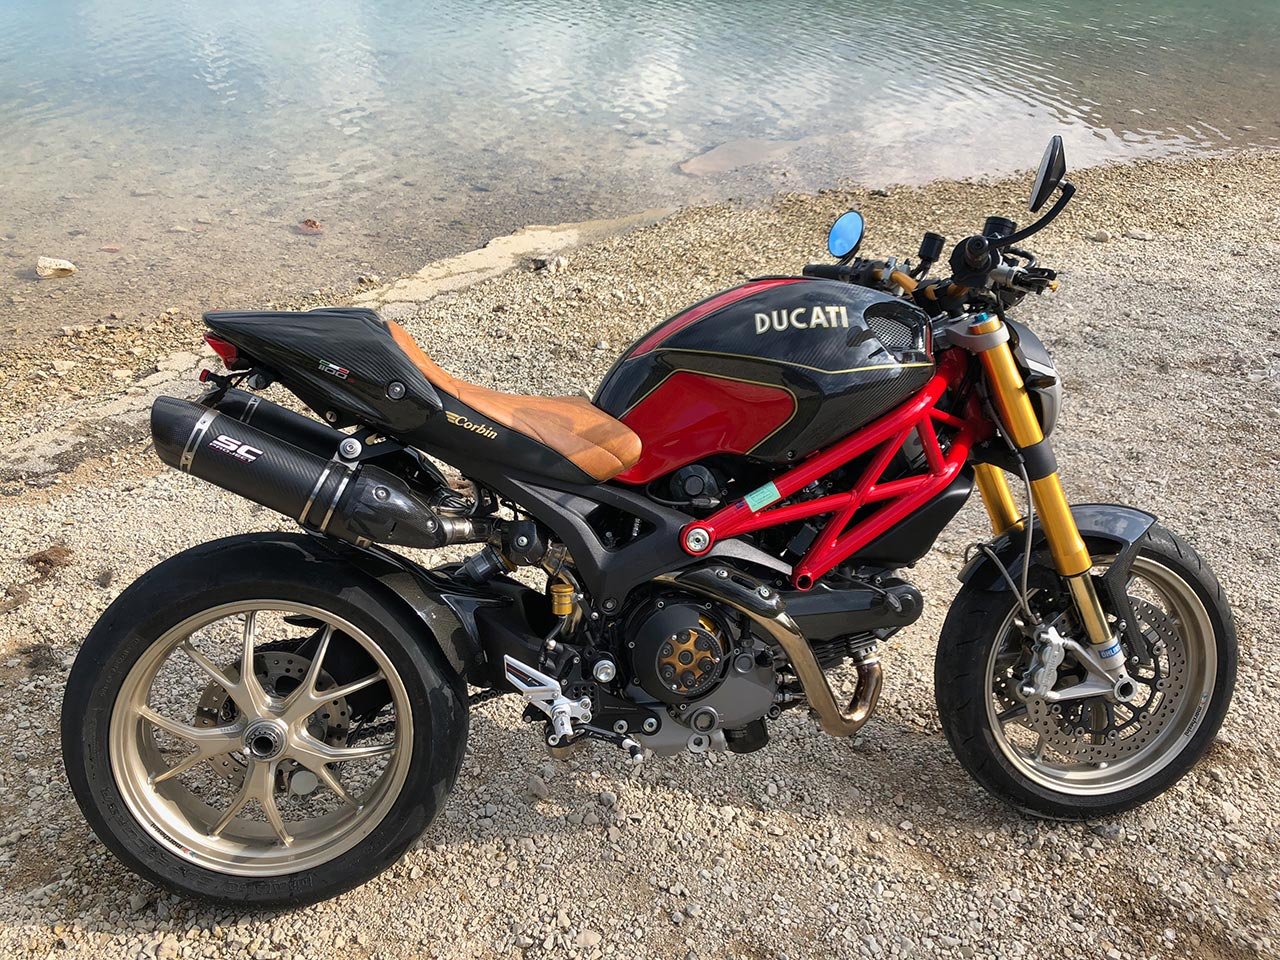 2009 Ducati 1100S